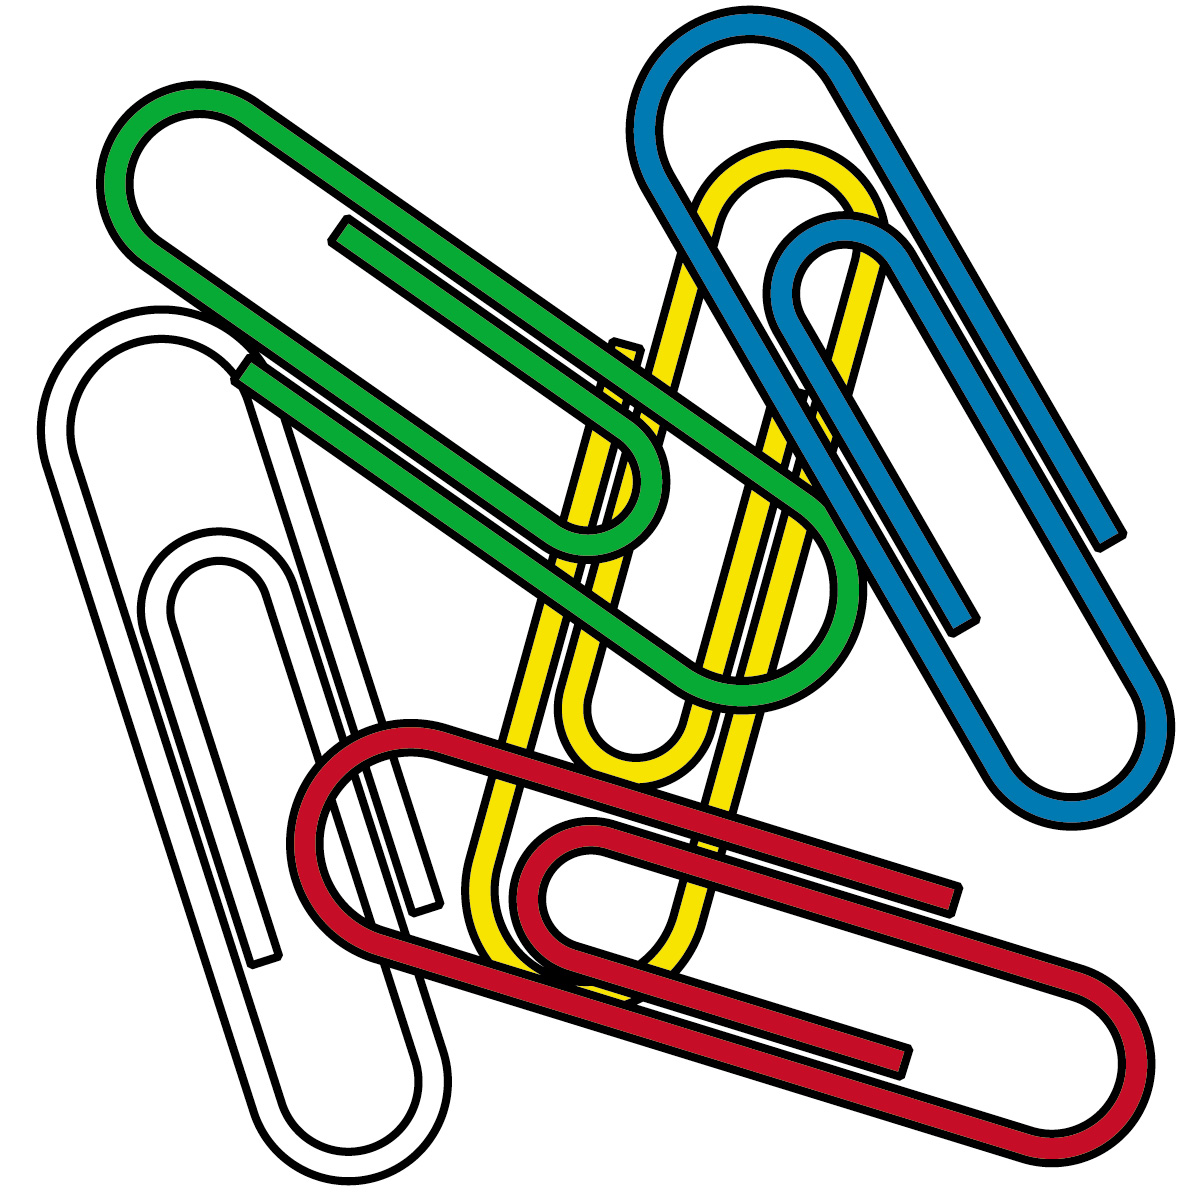 Free Paper Clip Clipart, Download Free Clip Art, Free Clip.